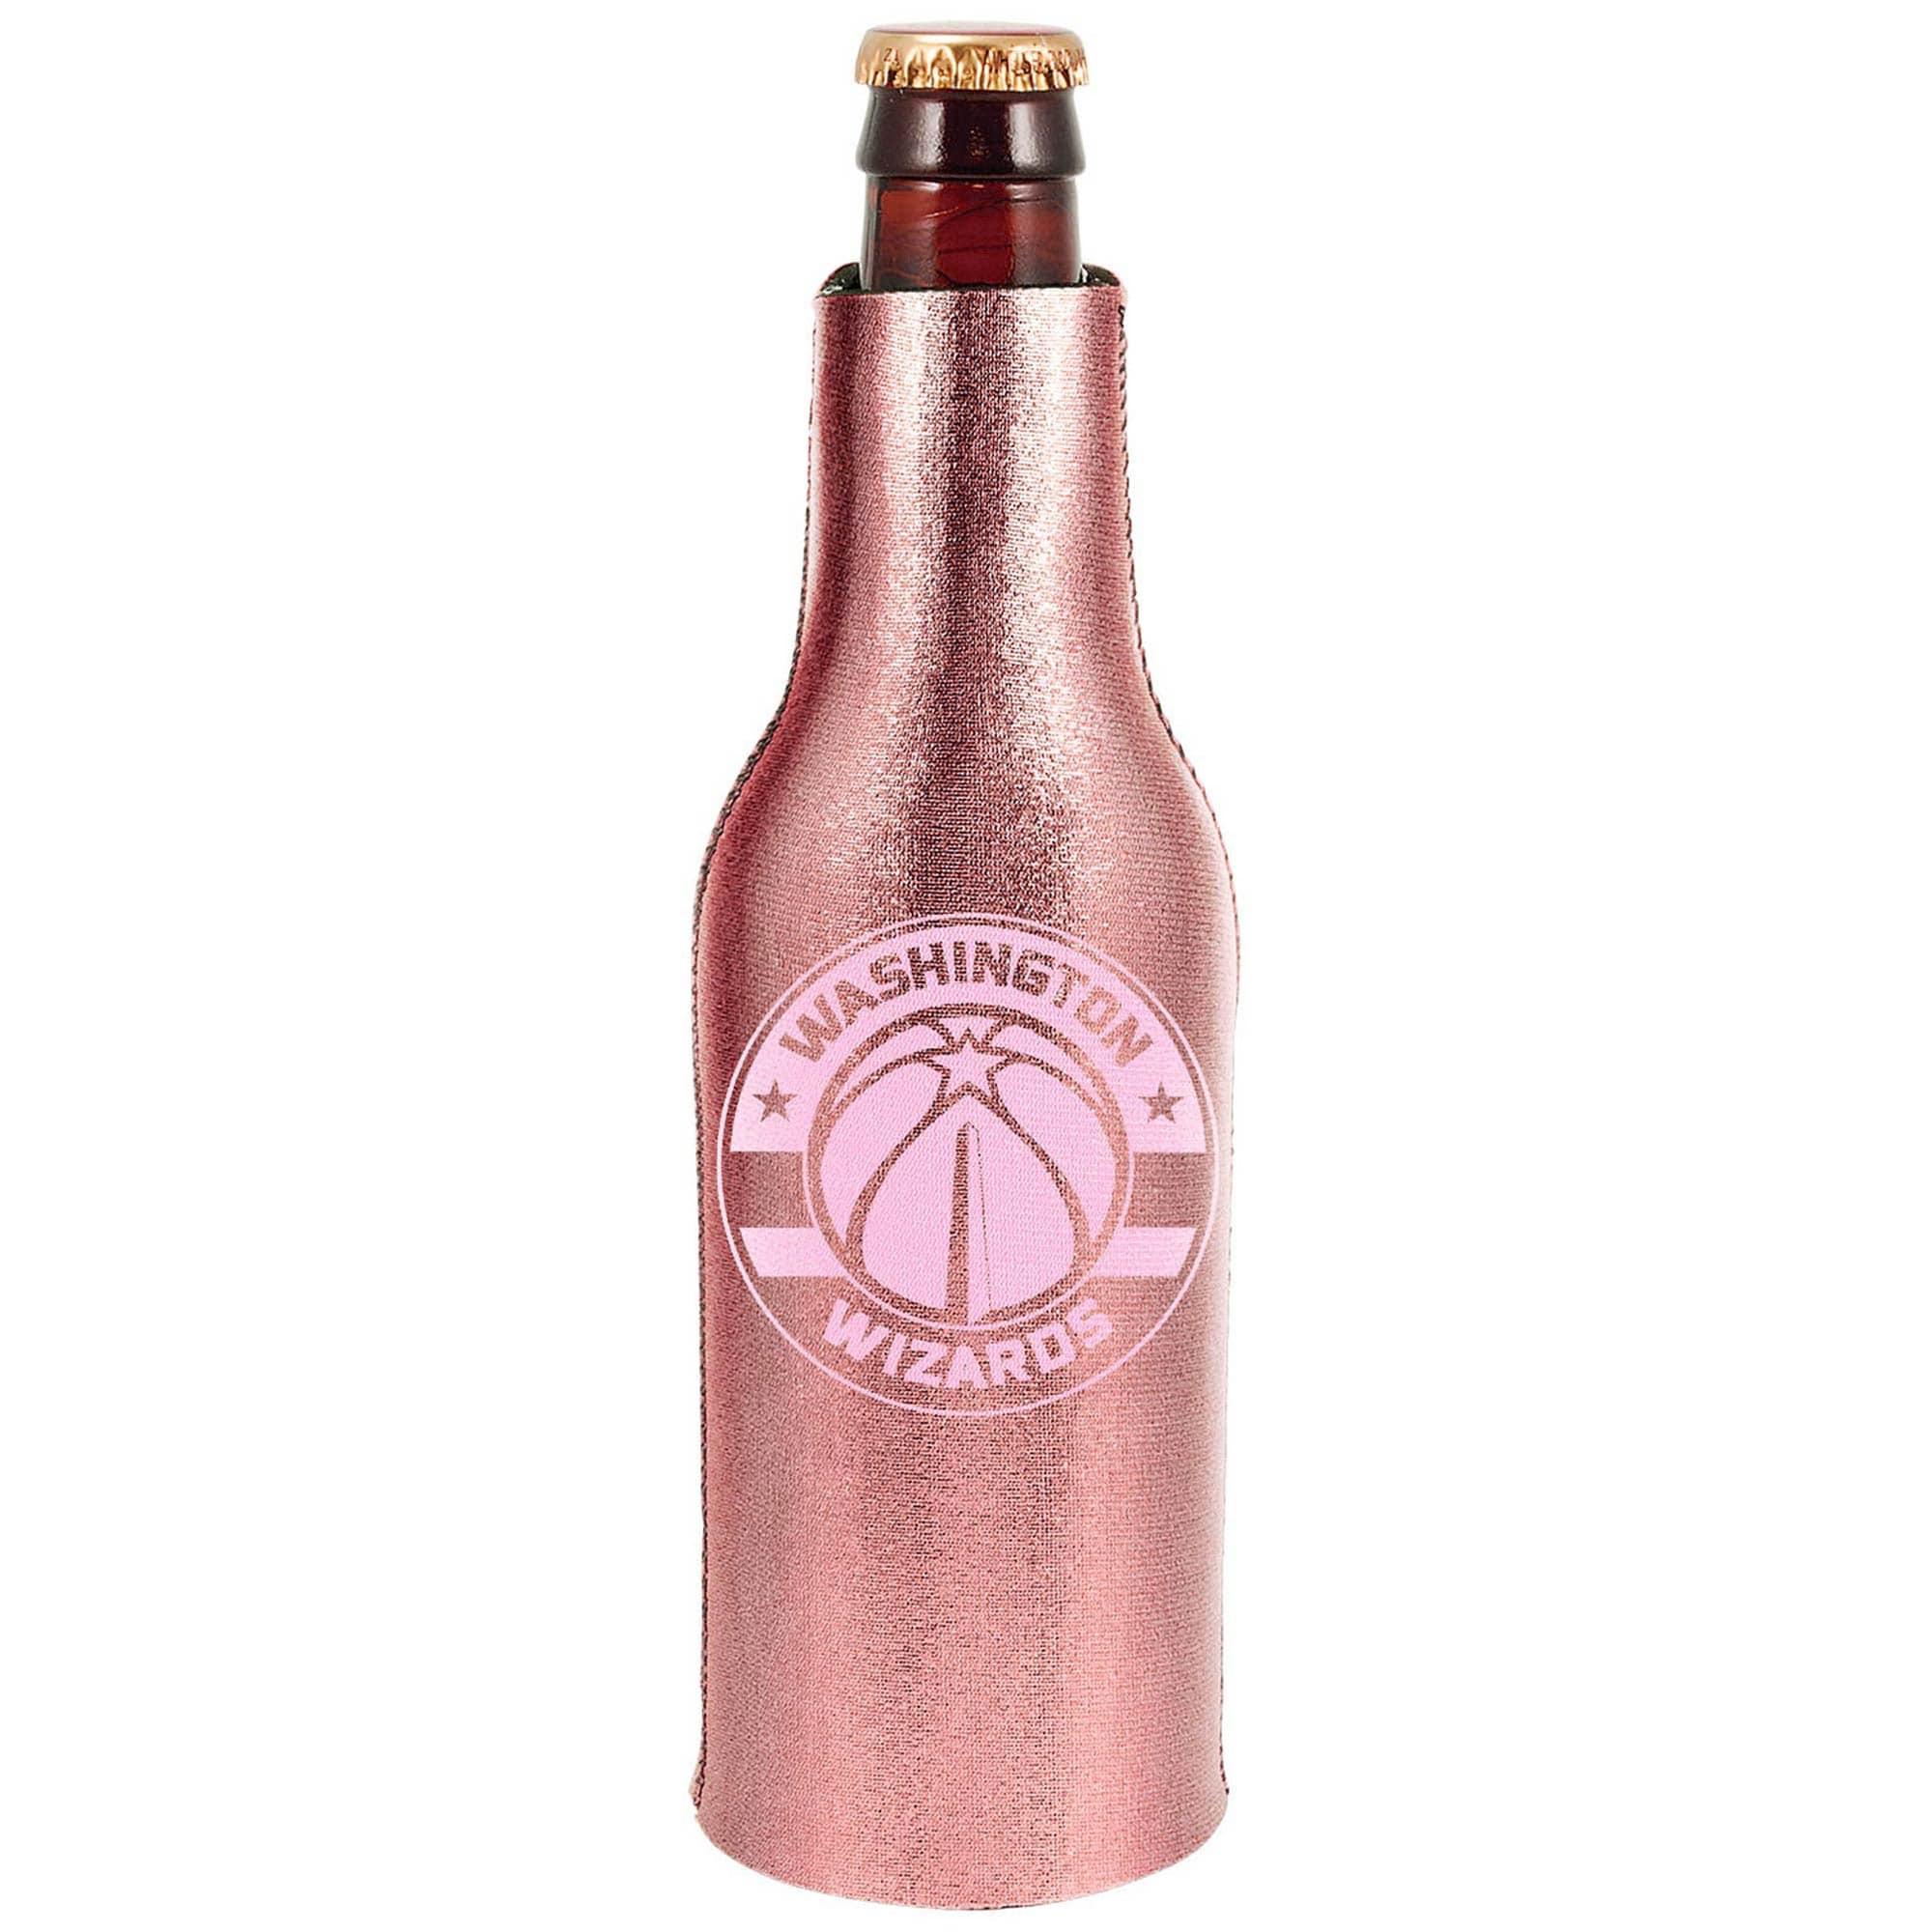 Washington Wizards 12oz. Rose Gold Bottle Cooler